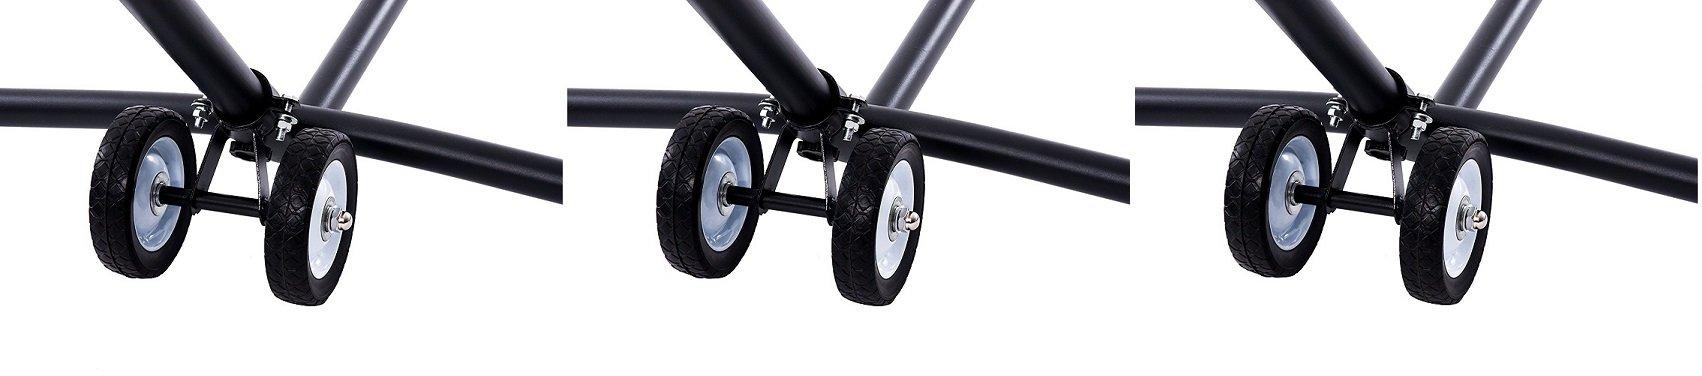 Vivere WHEEL Hammock Stand Wheel Kit (3 Kits)